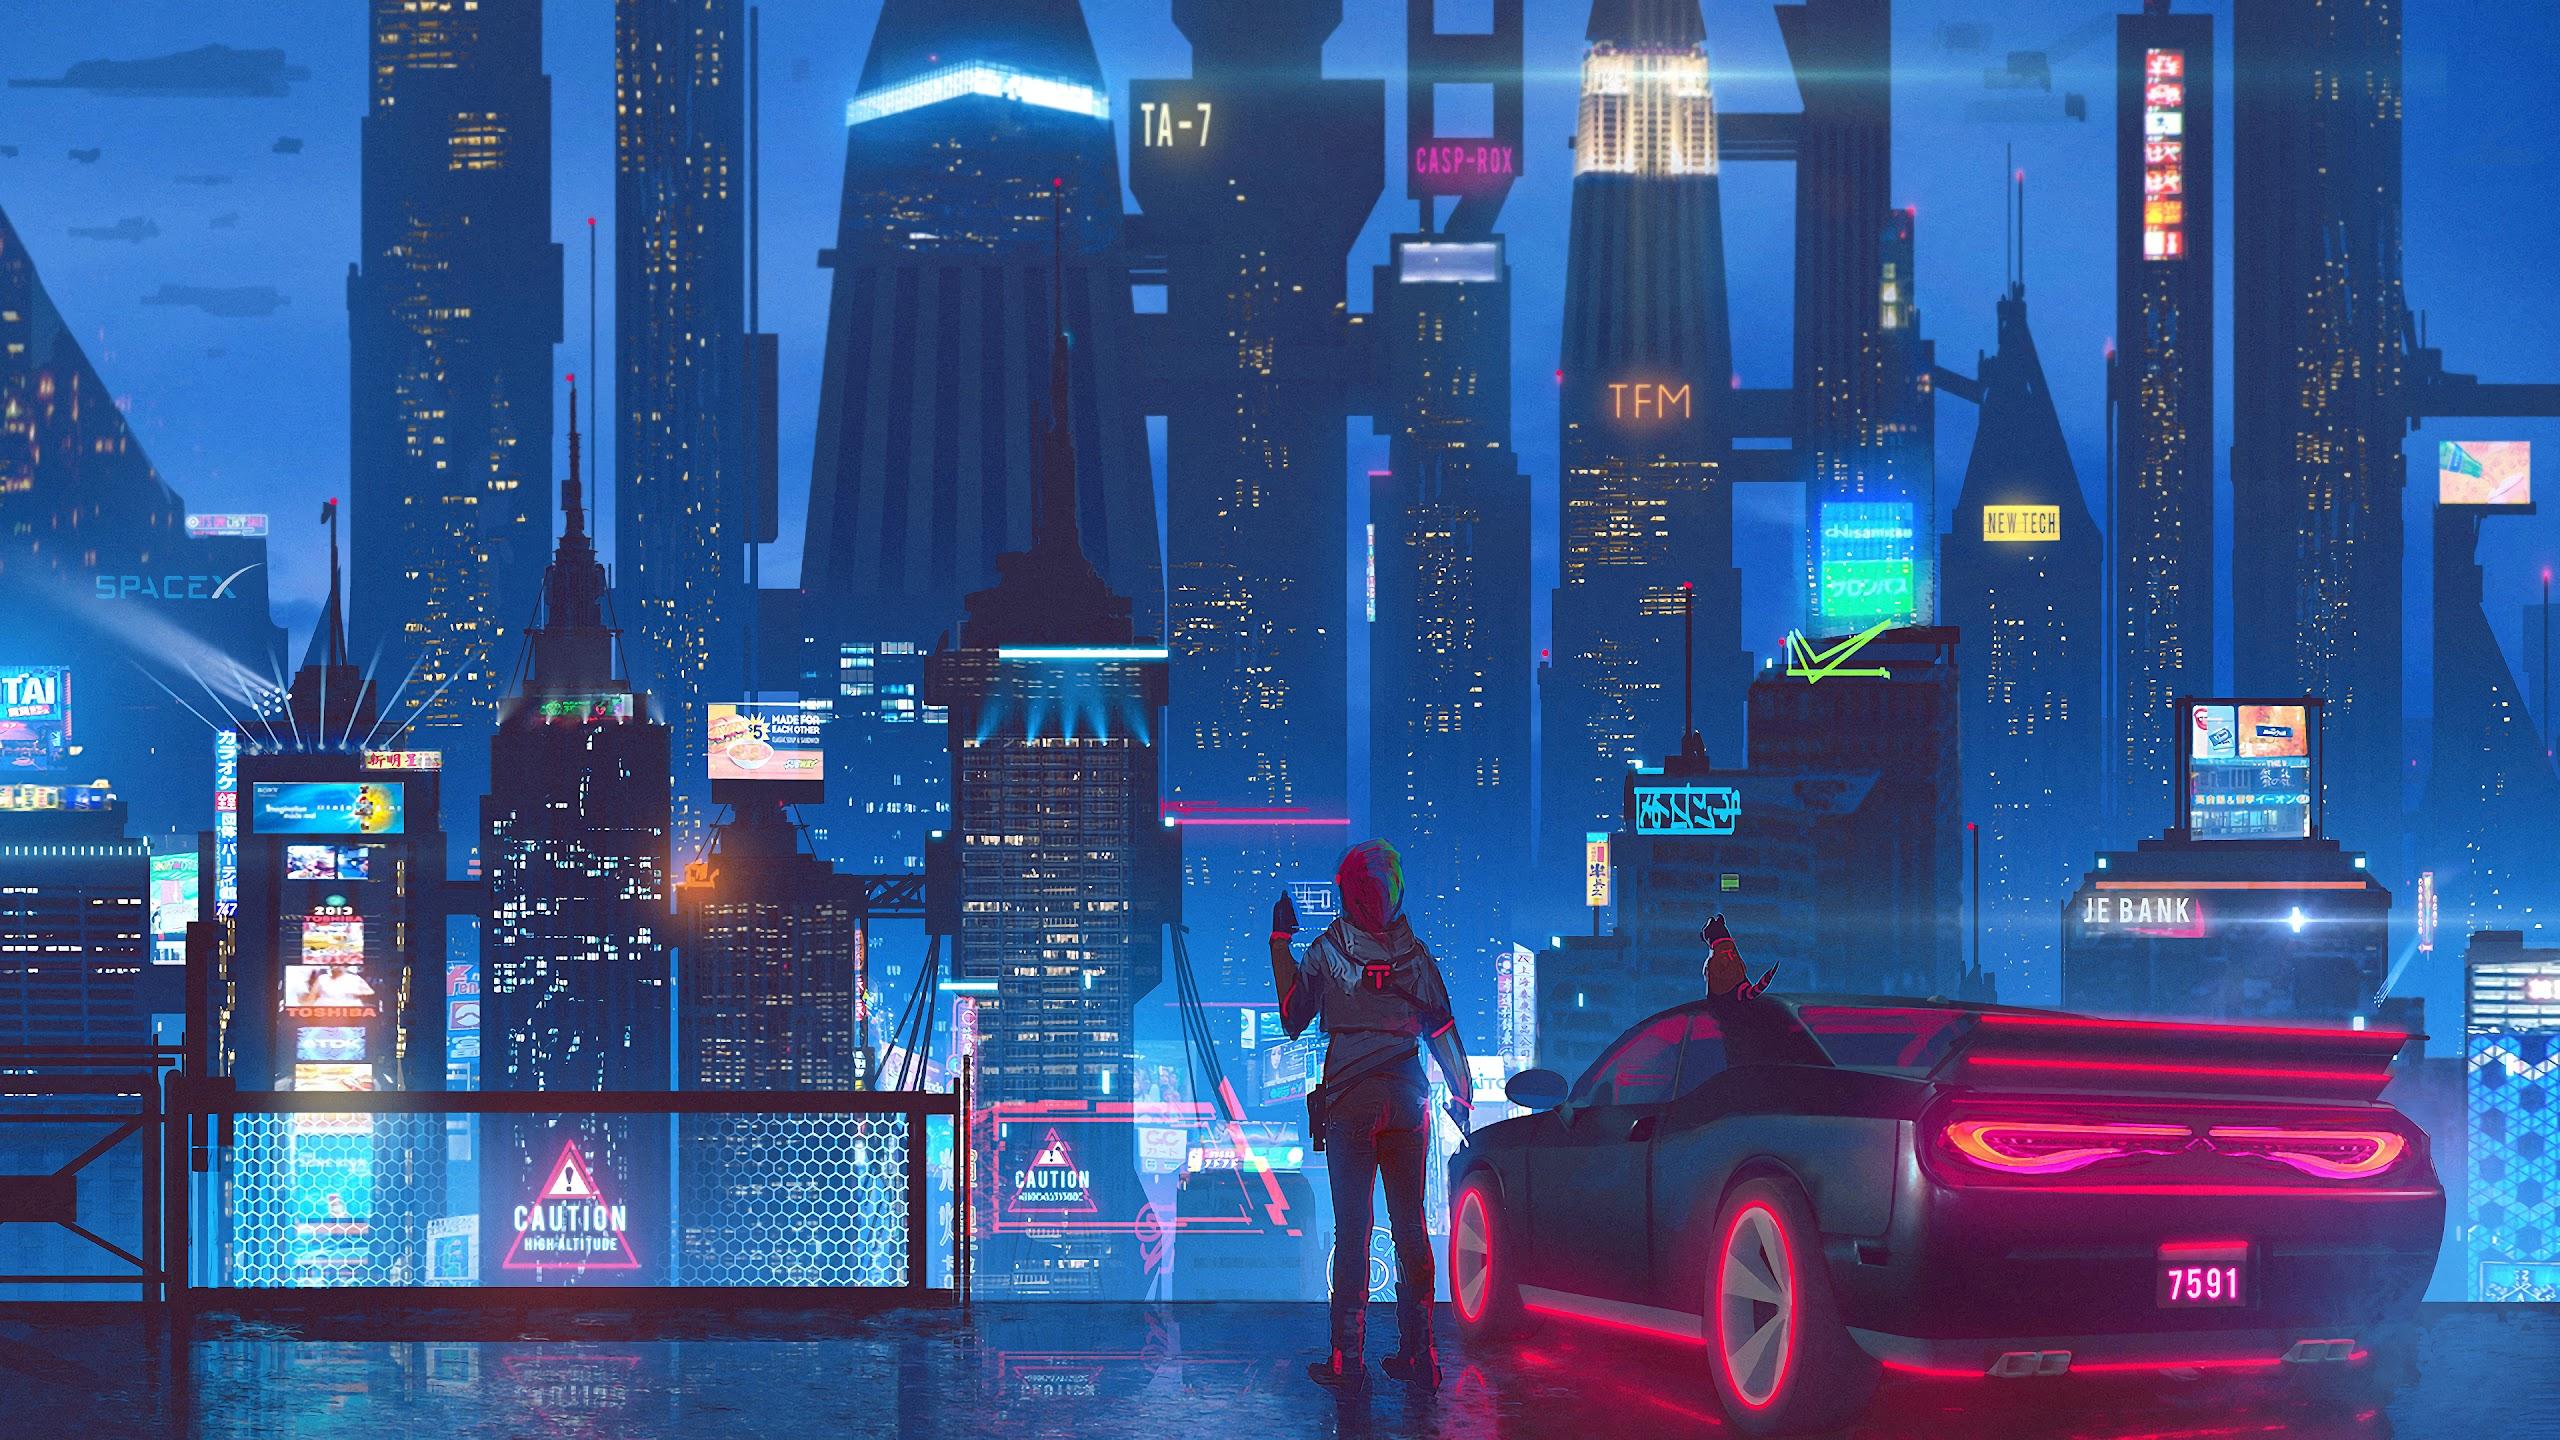 Sci Fi Cyberpunk City 4k Wallpaper 108